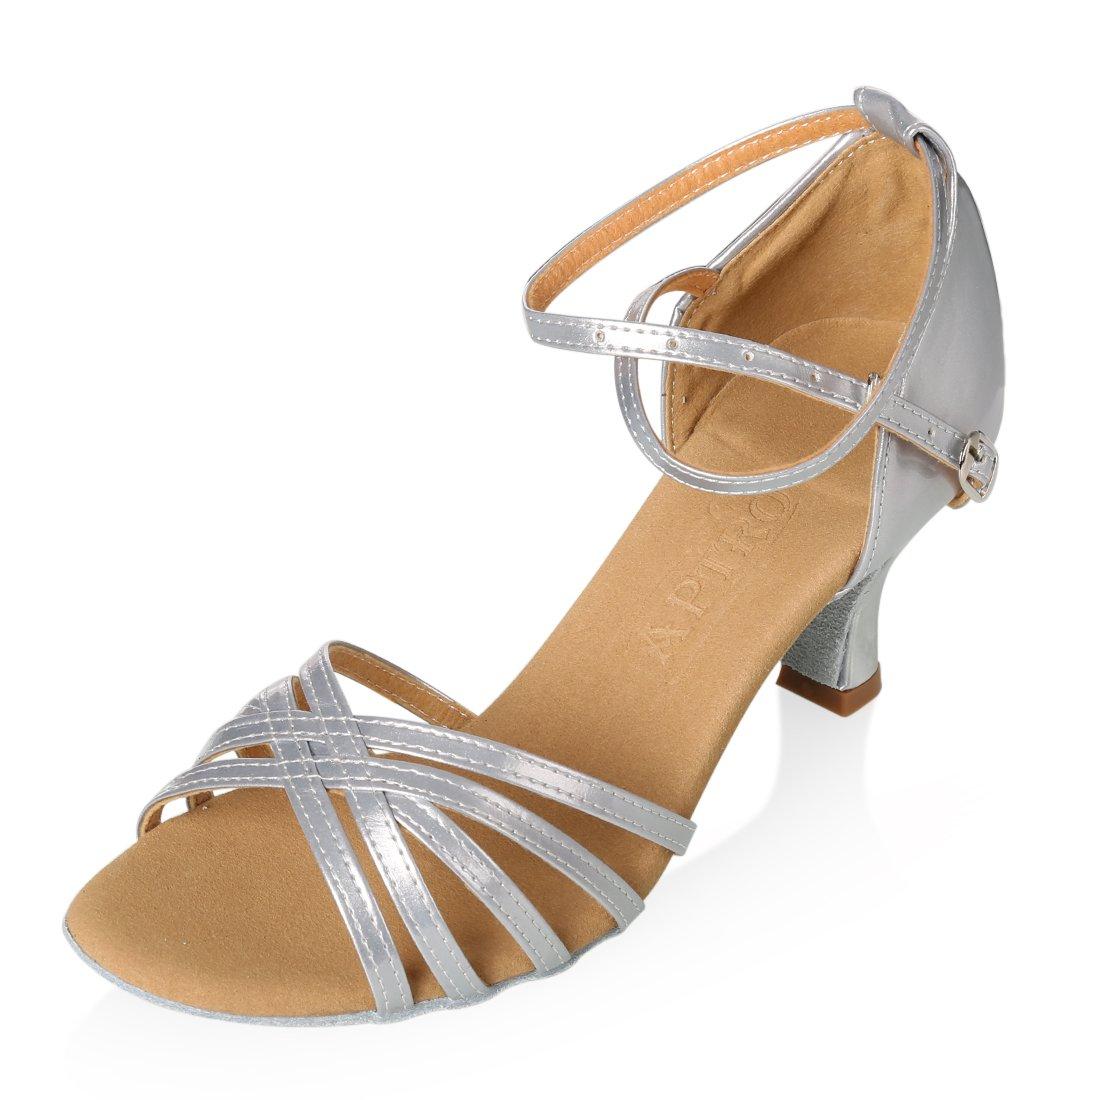 APTRO Damen Schuhe Tanzschuhe Ballsaal Latin Tanzen Silber Sandalen  38 EU|Silber